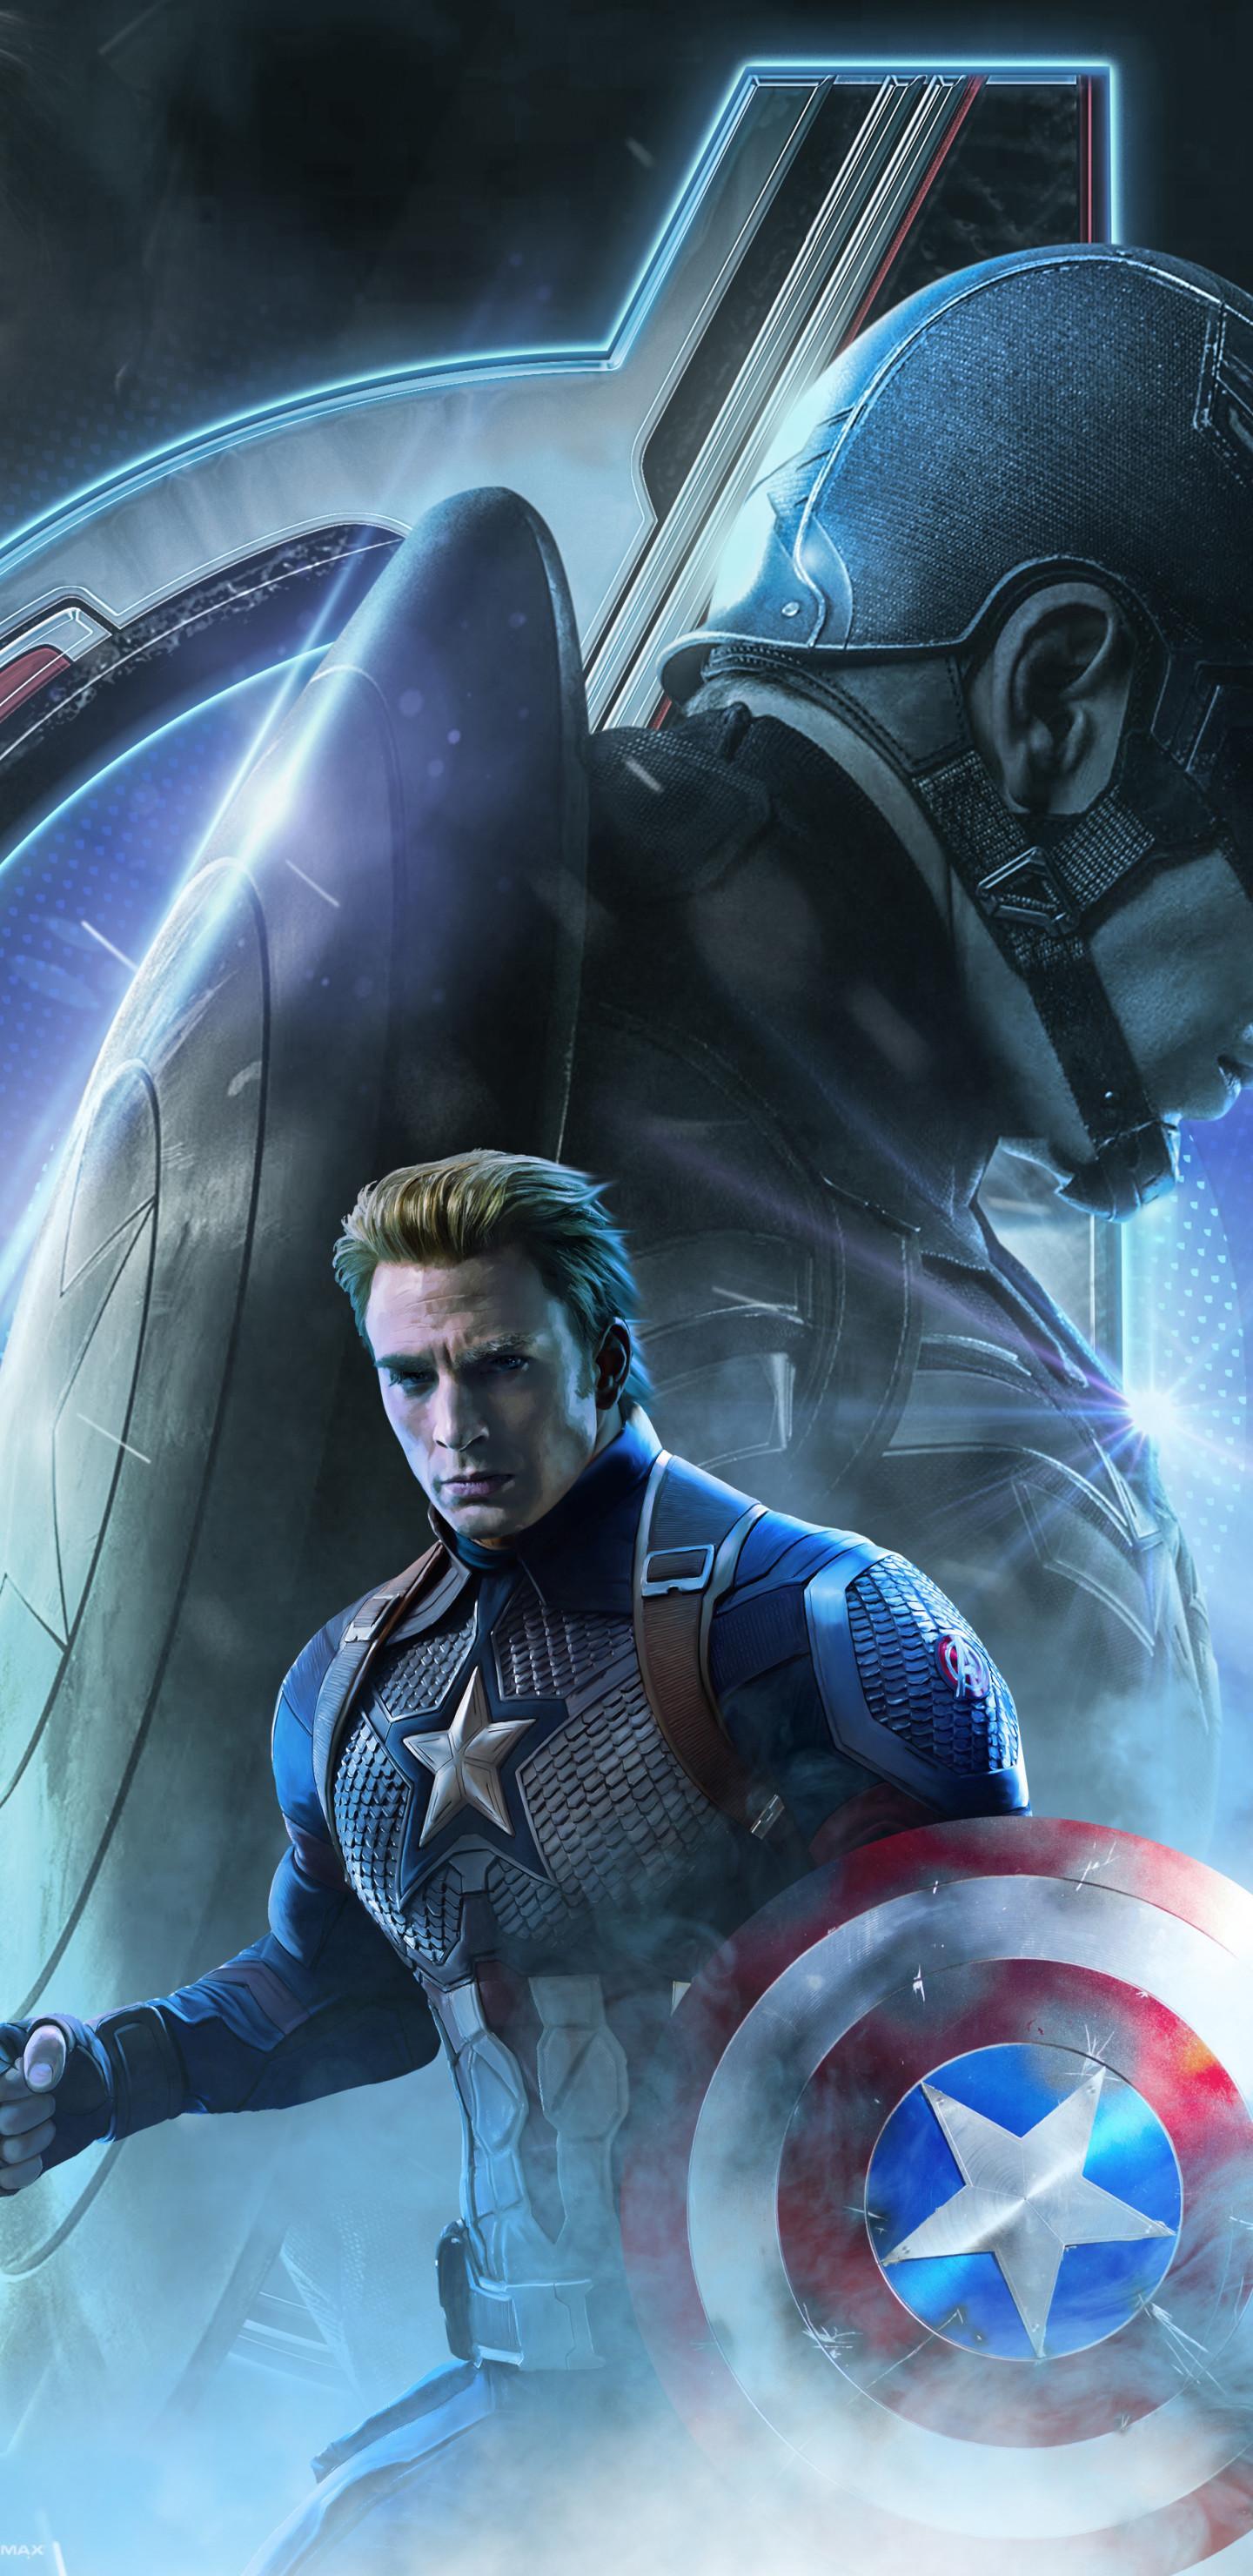 Captain America Samsung Phone Wallpapers - Wallpaper Cave